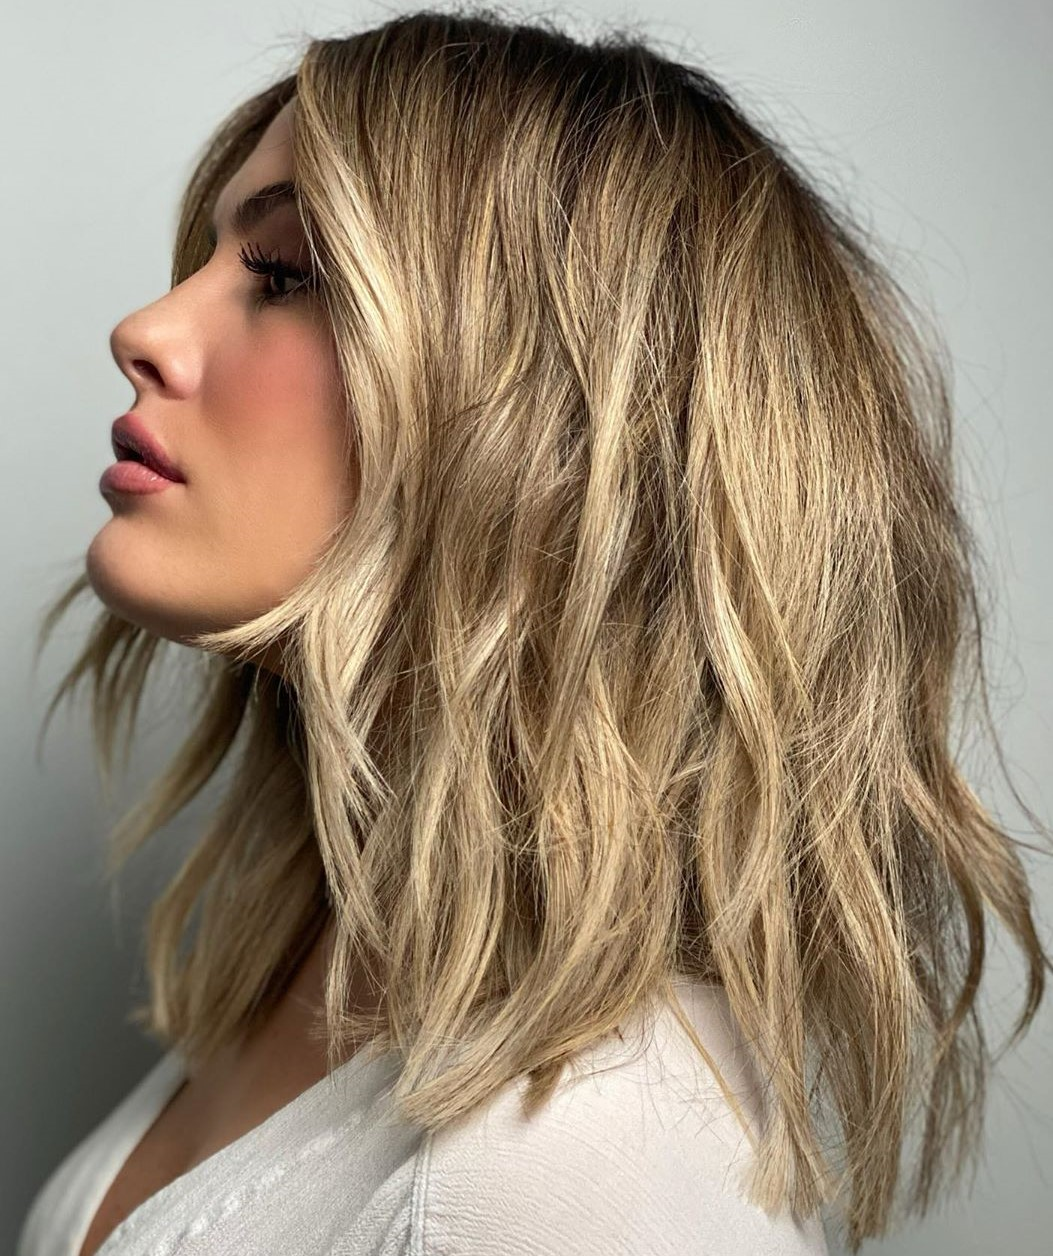 Shoulder-Length Dirty Blonde Cut